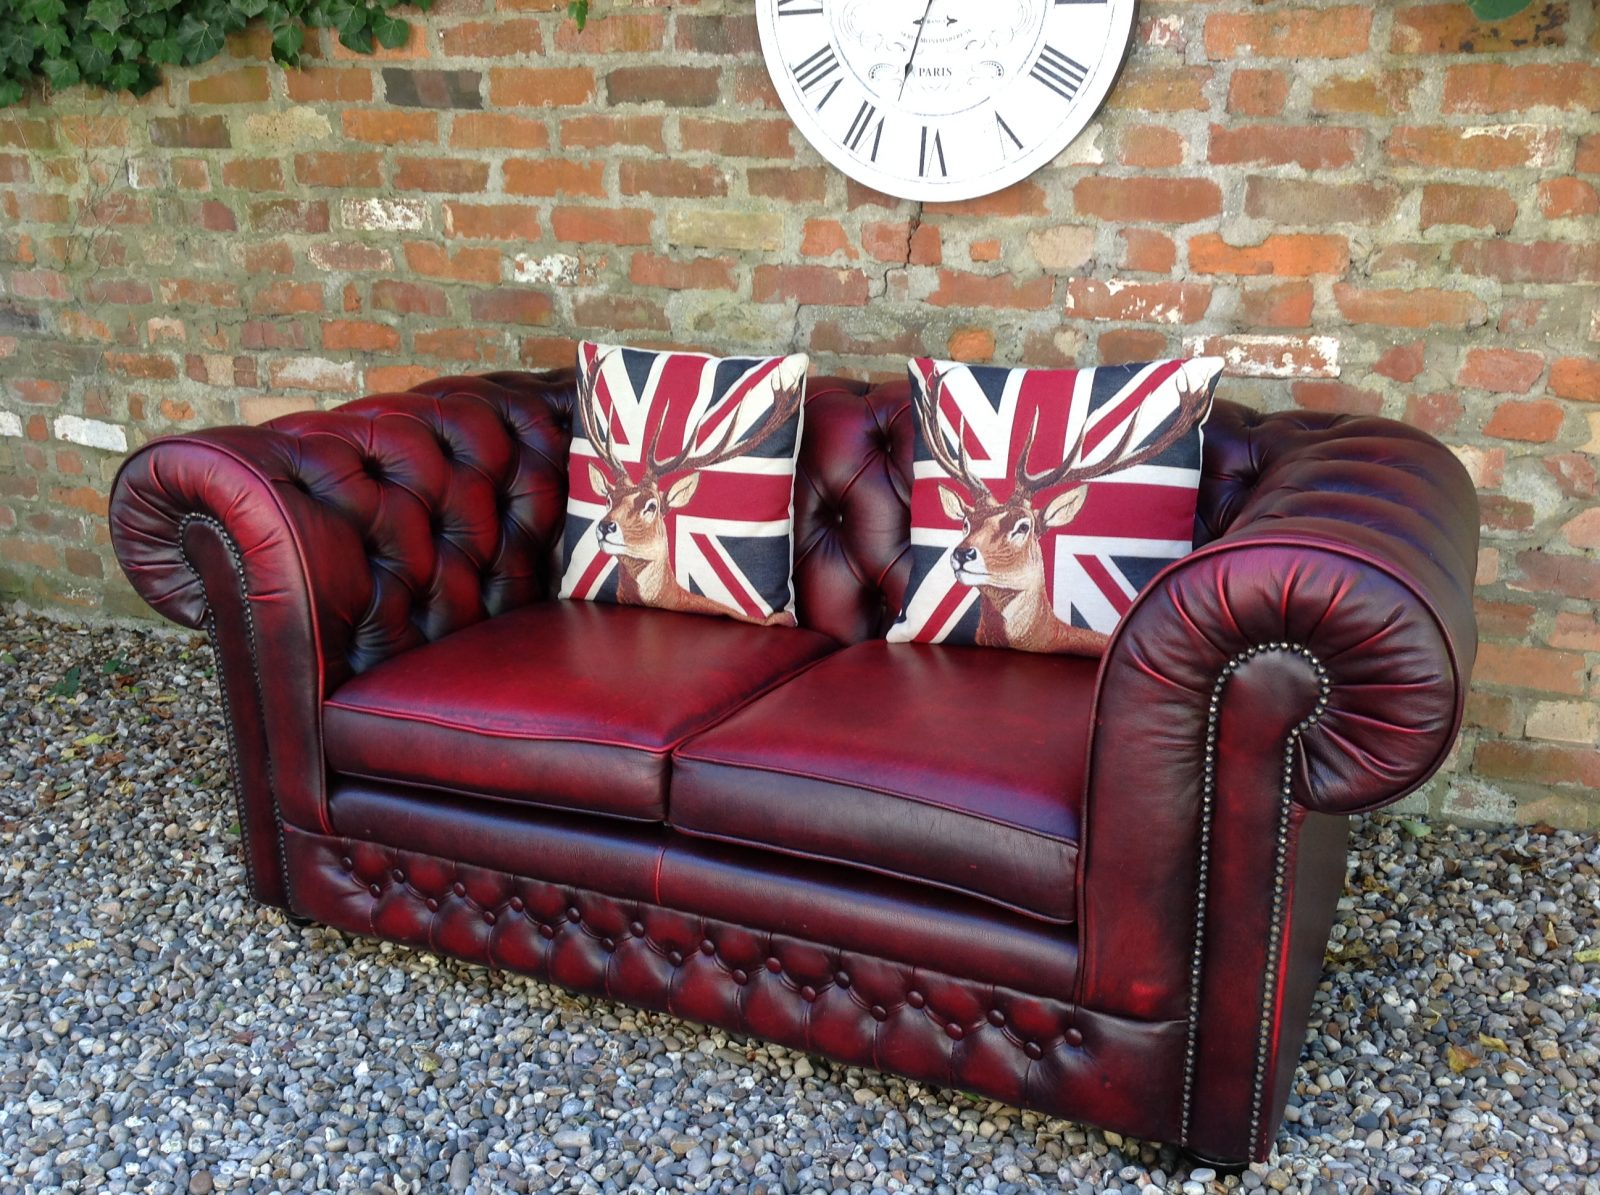 Oxblood Thomas Lloyd 2 Seater Chesterfield Sofa.